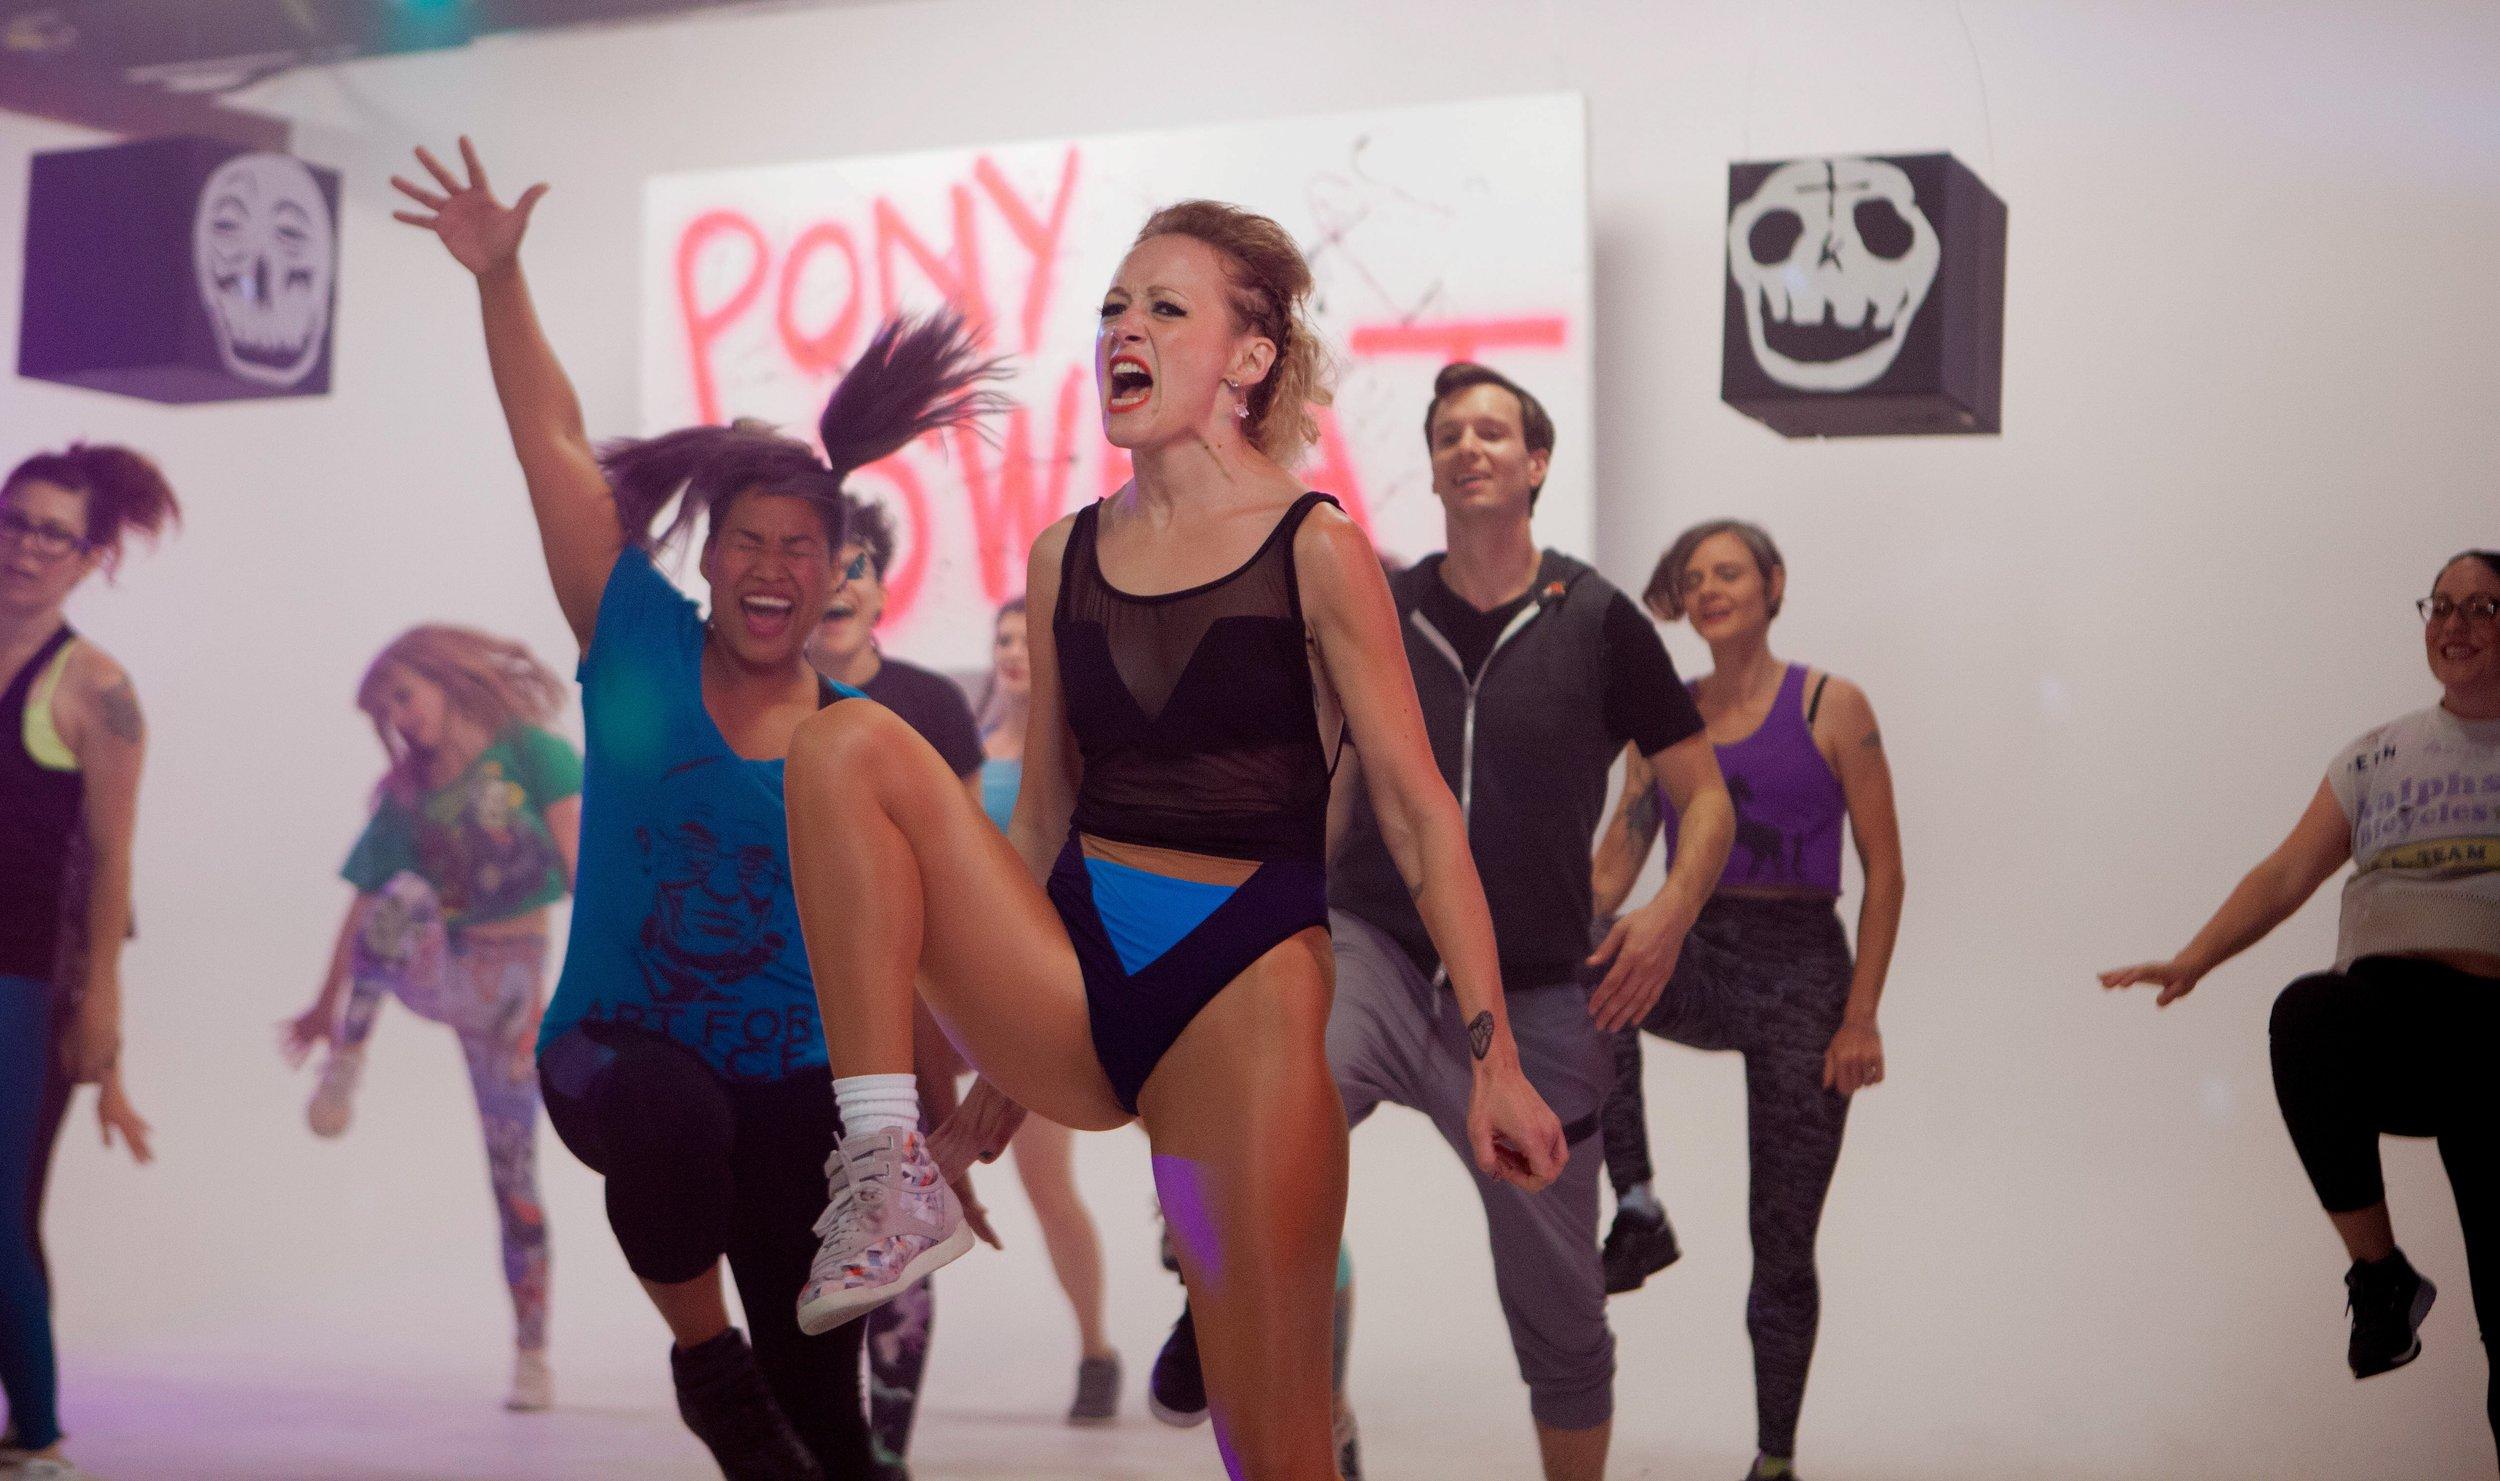 pony-sweat-youtube-video.jpg